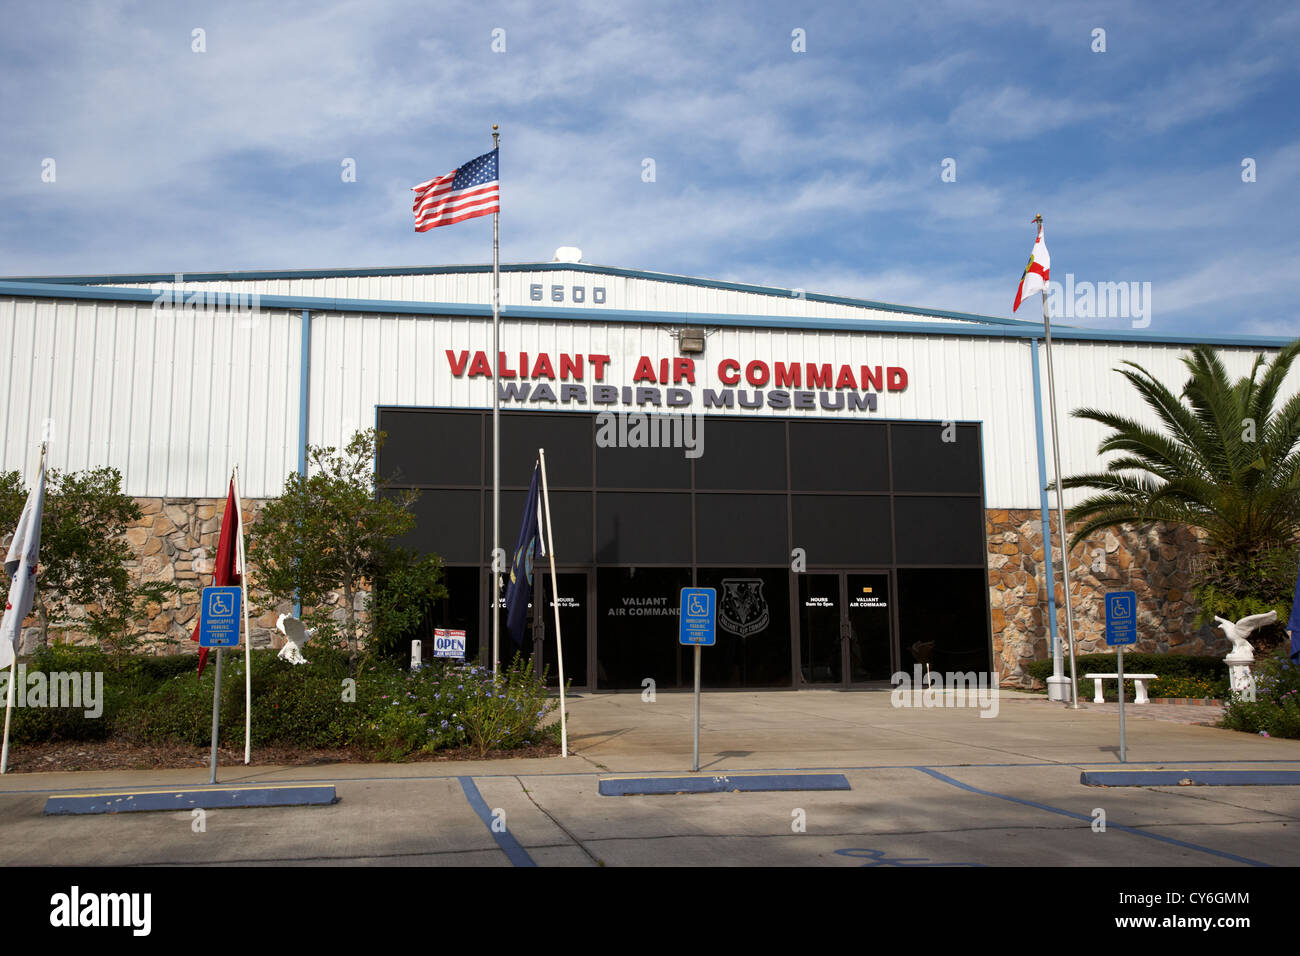 valiant air command warbird museum florida usa - Stock Image